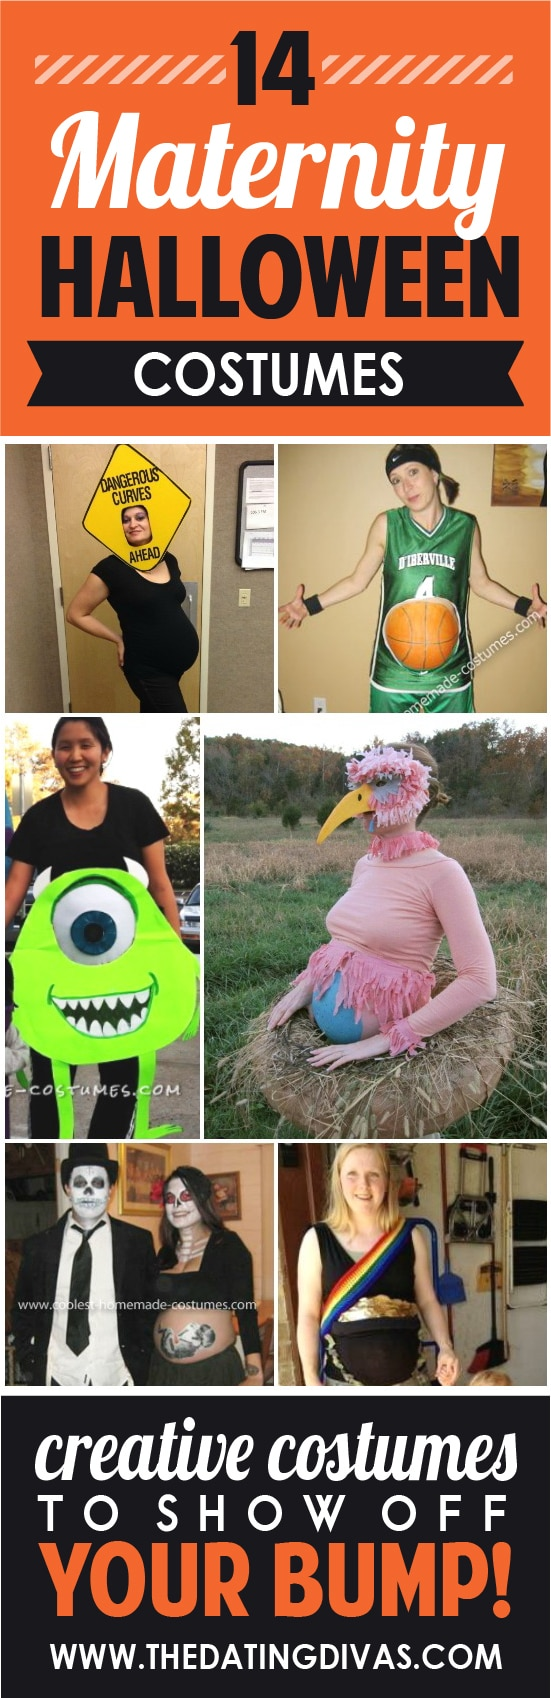 14 wonderful maternity halloween costumes